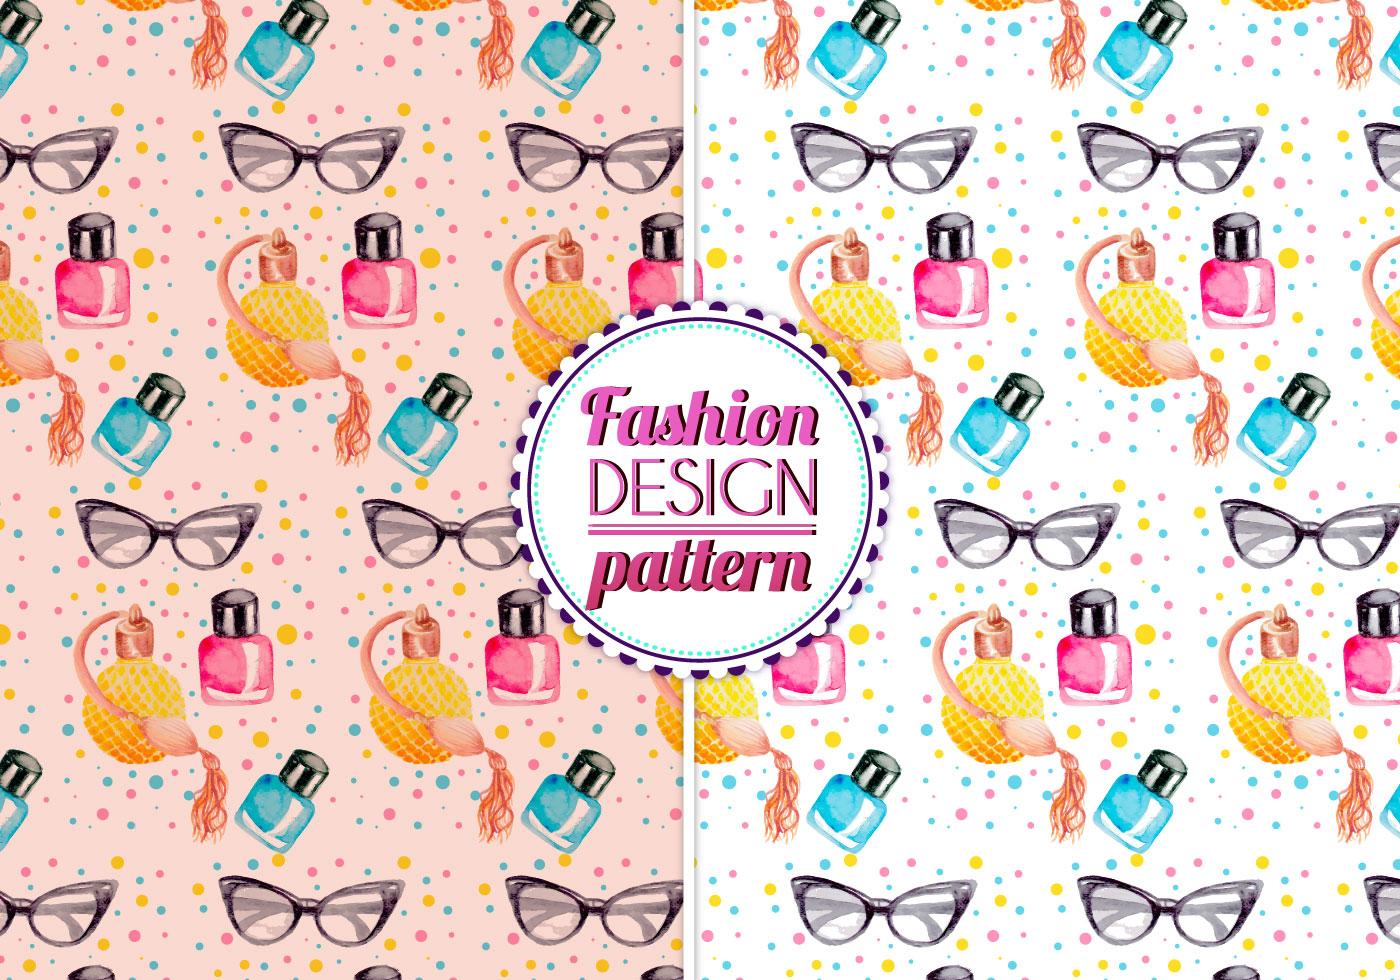 Fashion patterns free download Fashion, Sewing Patterns, Inspiration, Community, and